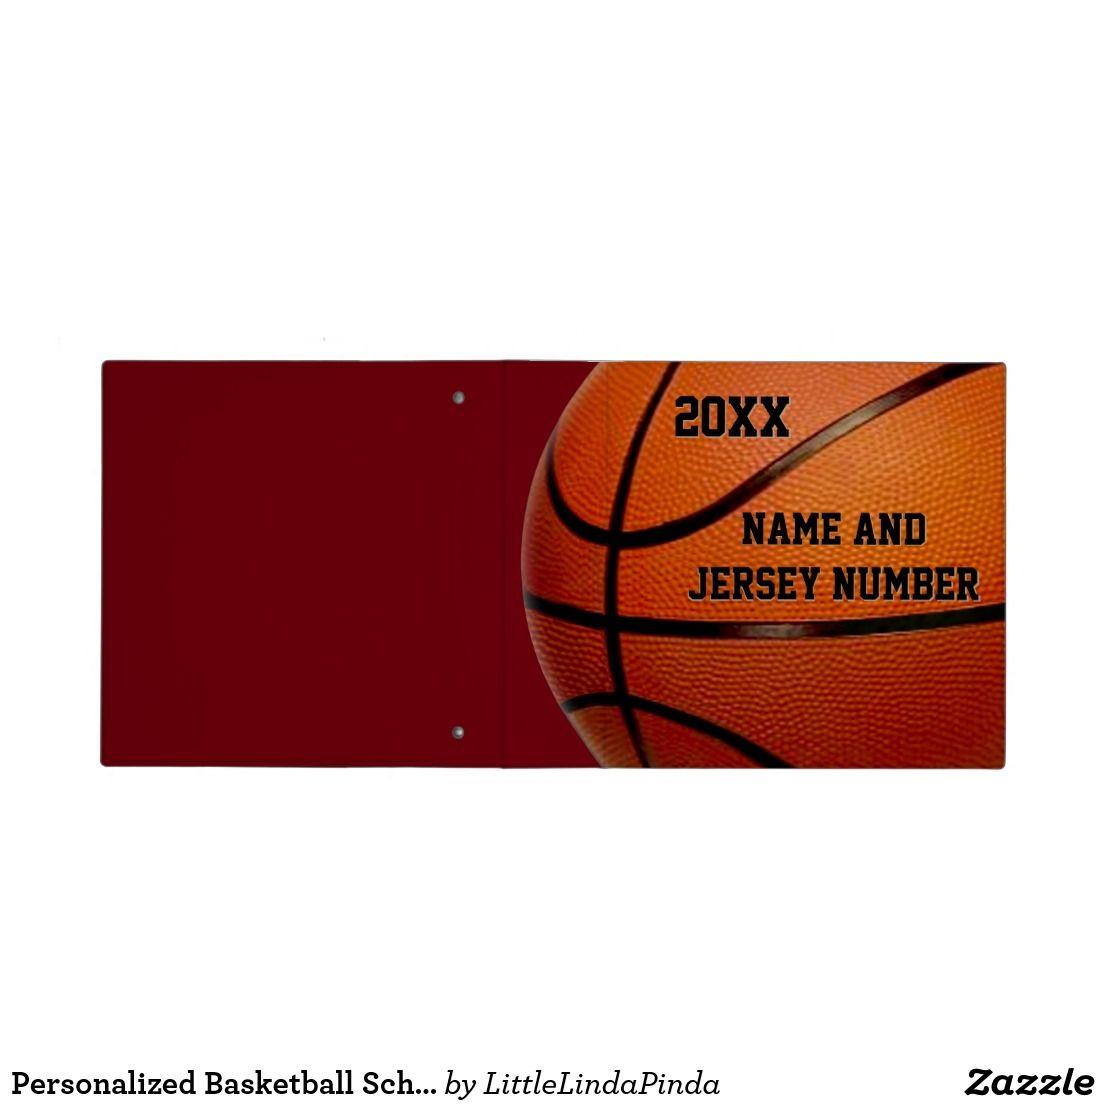 Personalized Basketball School Supplies, 3 Binder